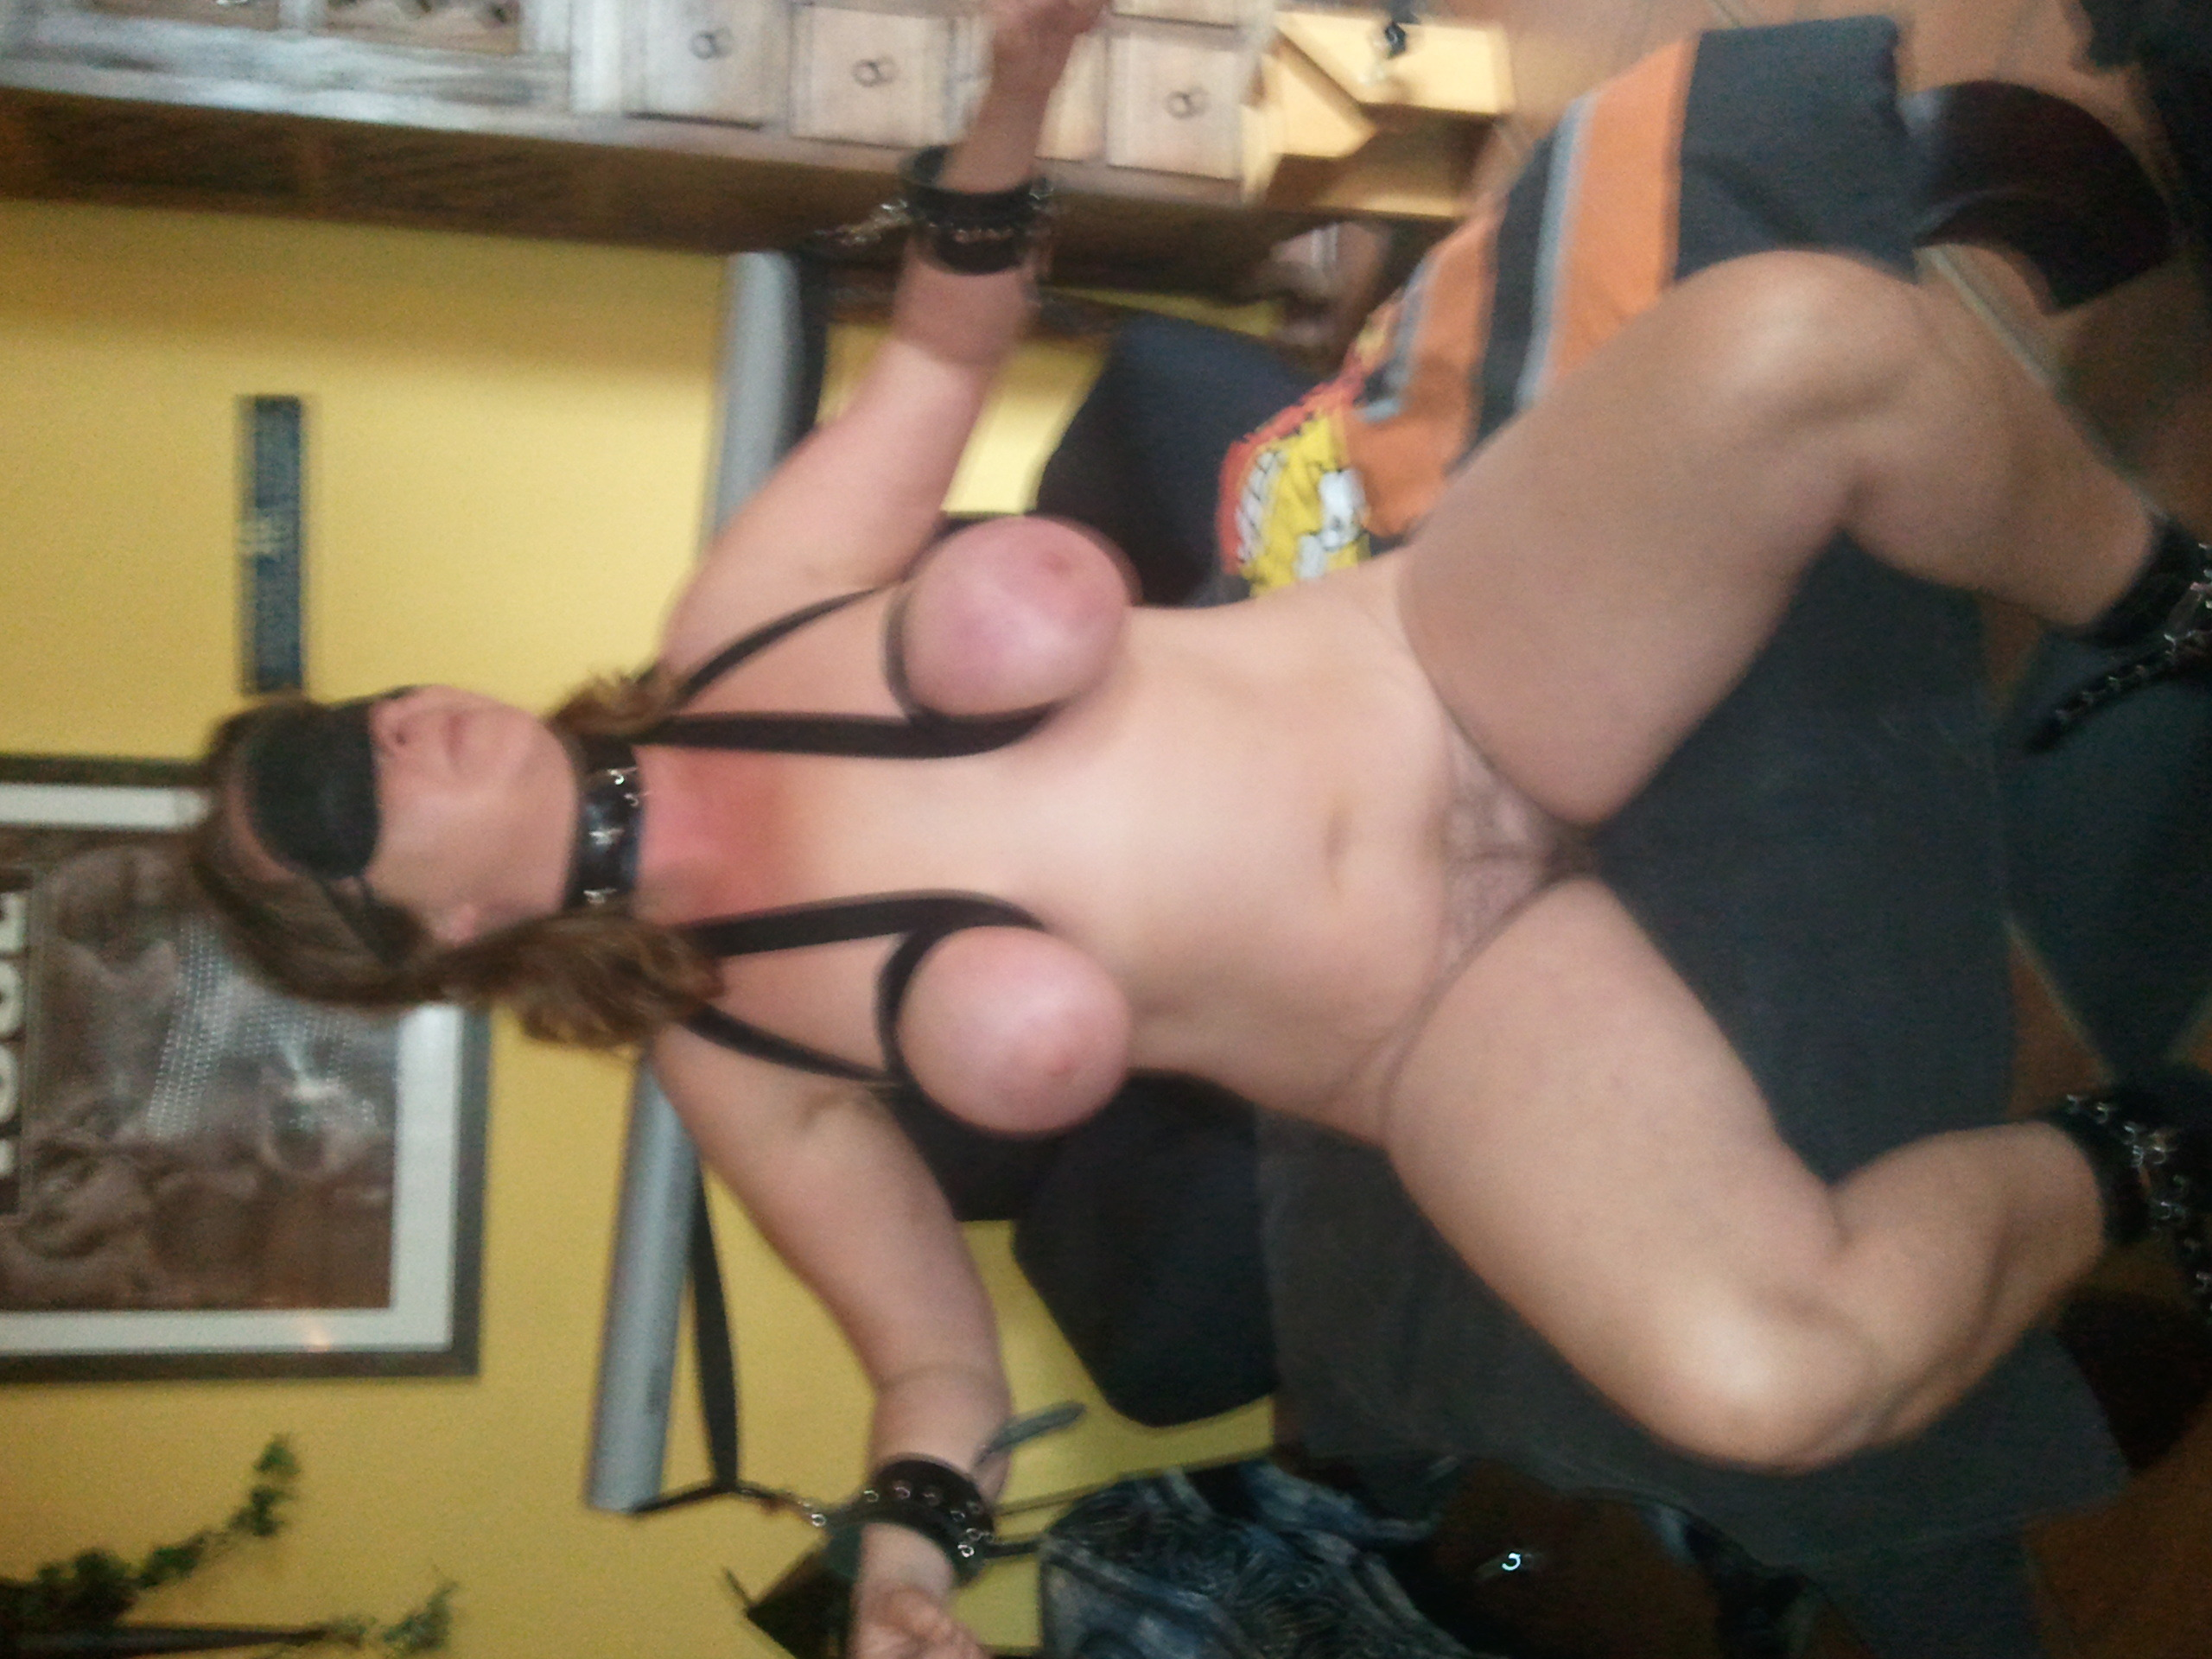 sklavin mieten bdsm massage